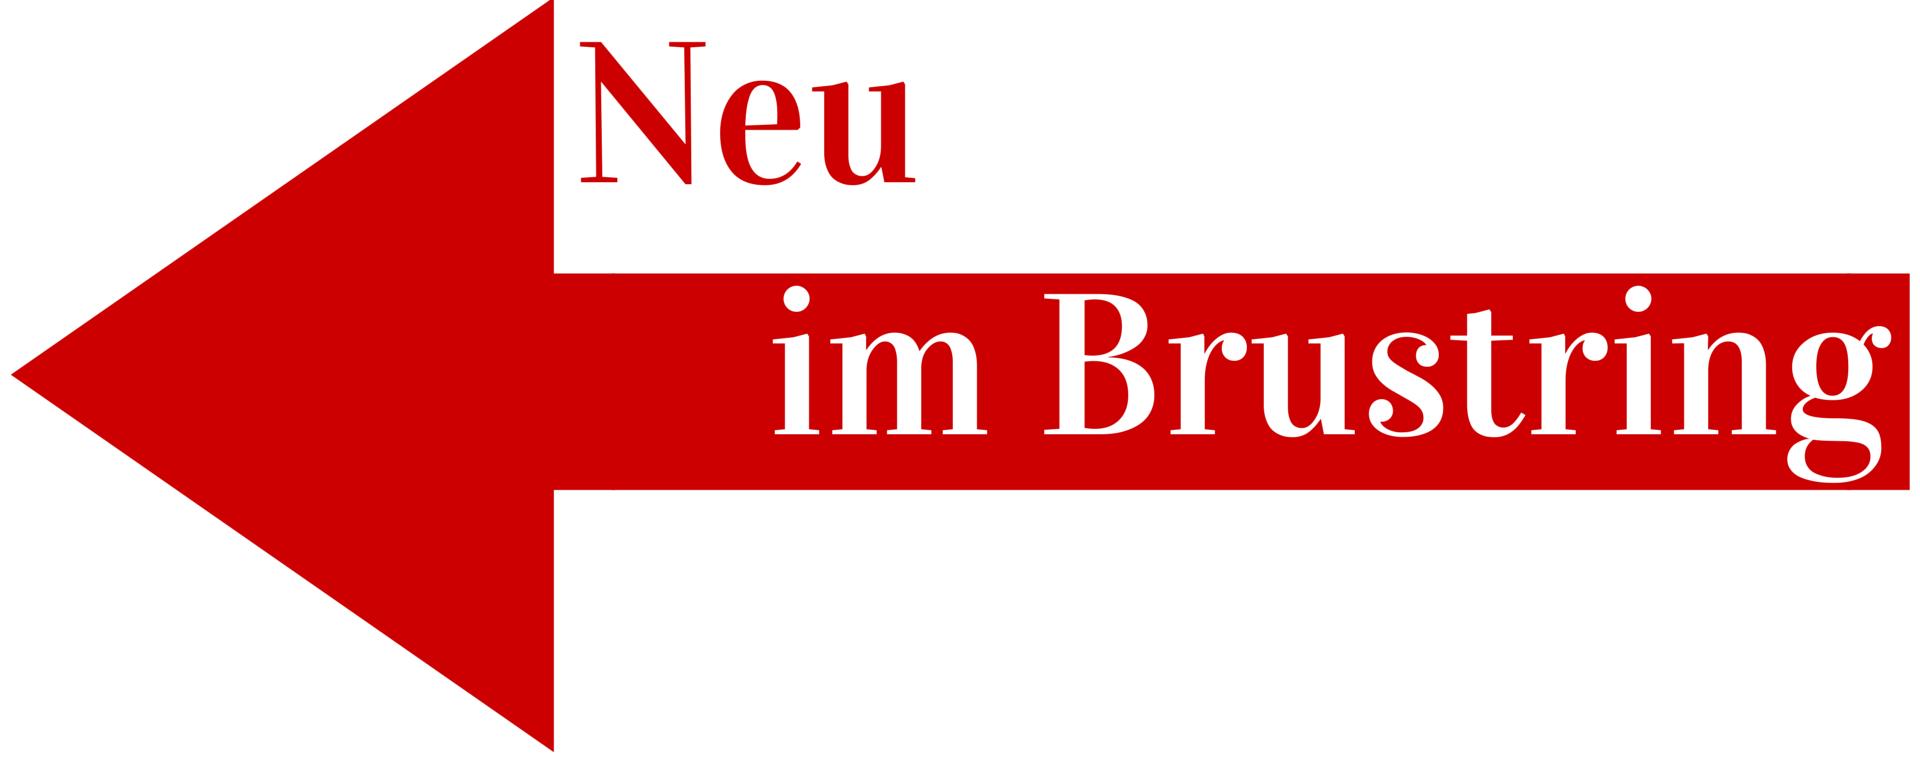 Neu im Brustring: Ofori, Brekalo, Onguéné,